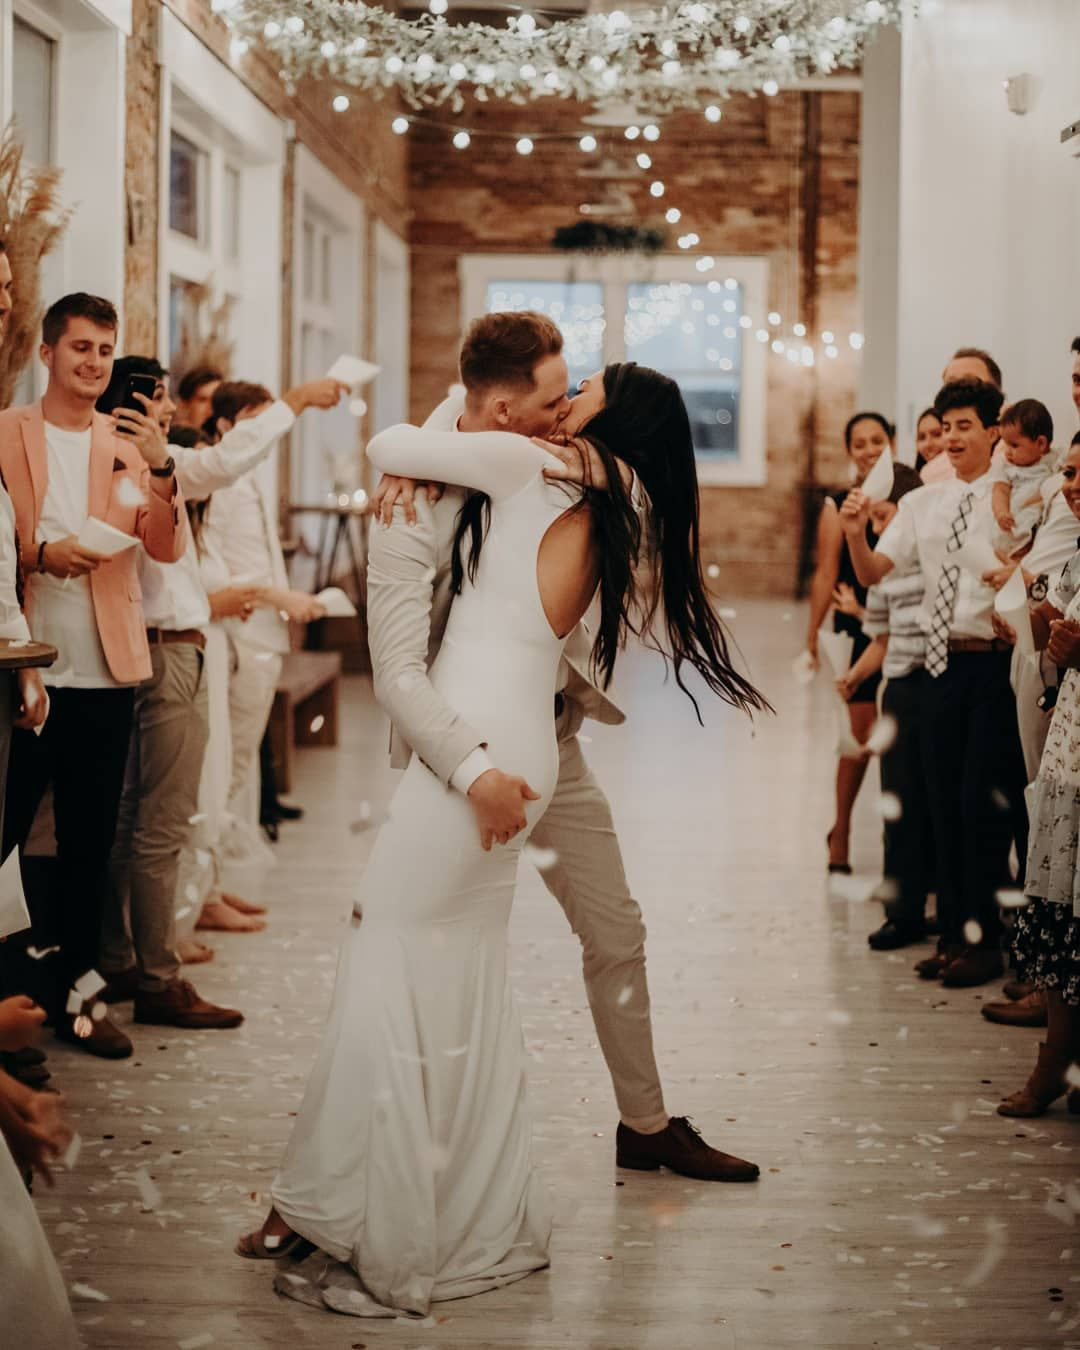 Junebug Weddings On Instagram We Re Just Groovin Our Way Into The Weekend Like Dalinnandcienna Junebug Weddings Fall Wedding Wedding Venues